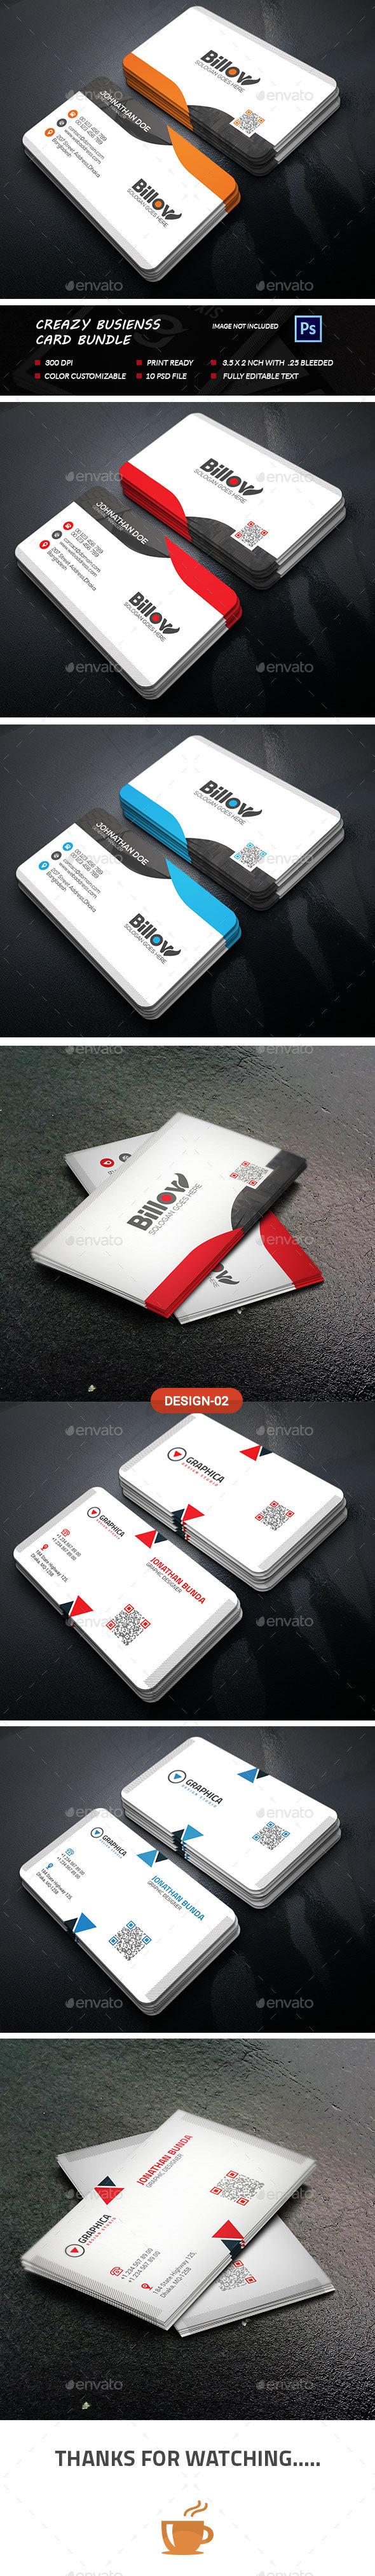 Crazy business card bundle by sixlock graphicriver crazy business card bundle business cards print templates colourmoves Gallery